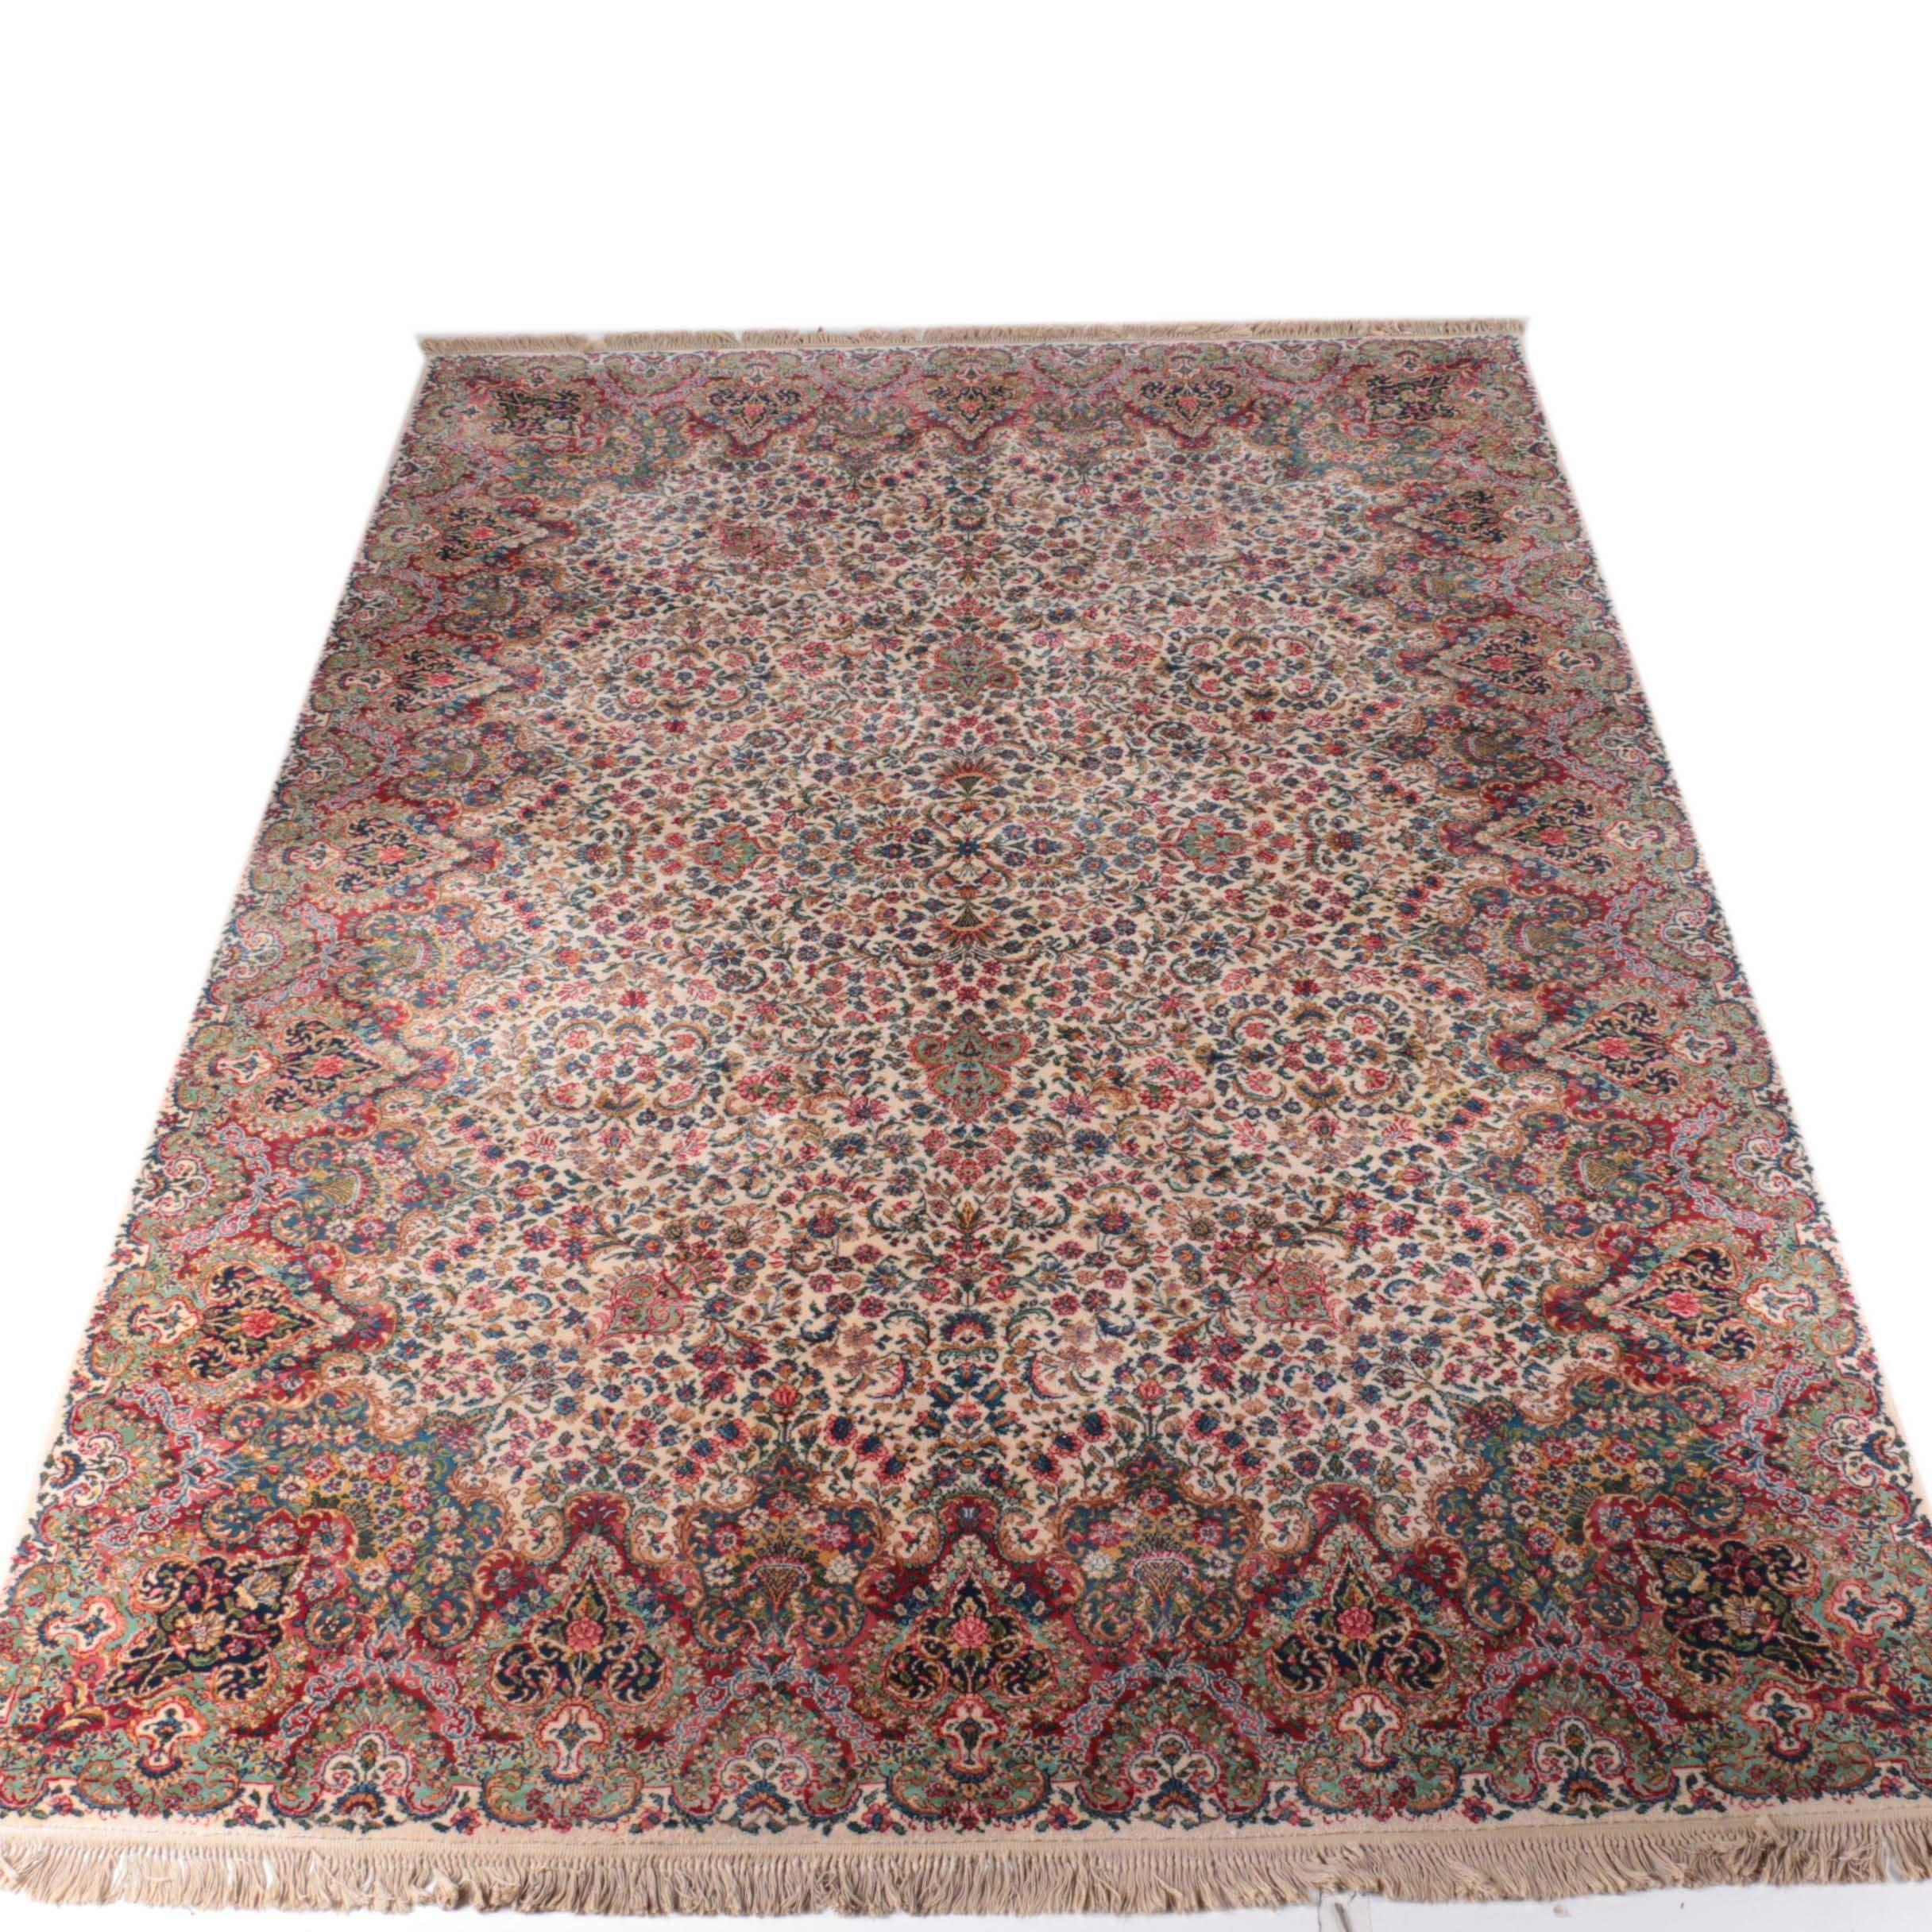 "Large Power-Loomed Karastan ""Kirman"" Wool Area Rug"